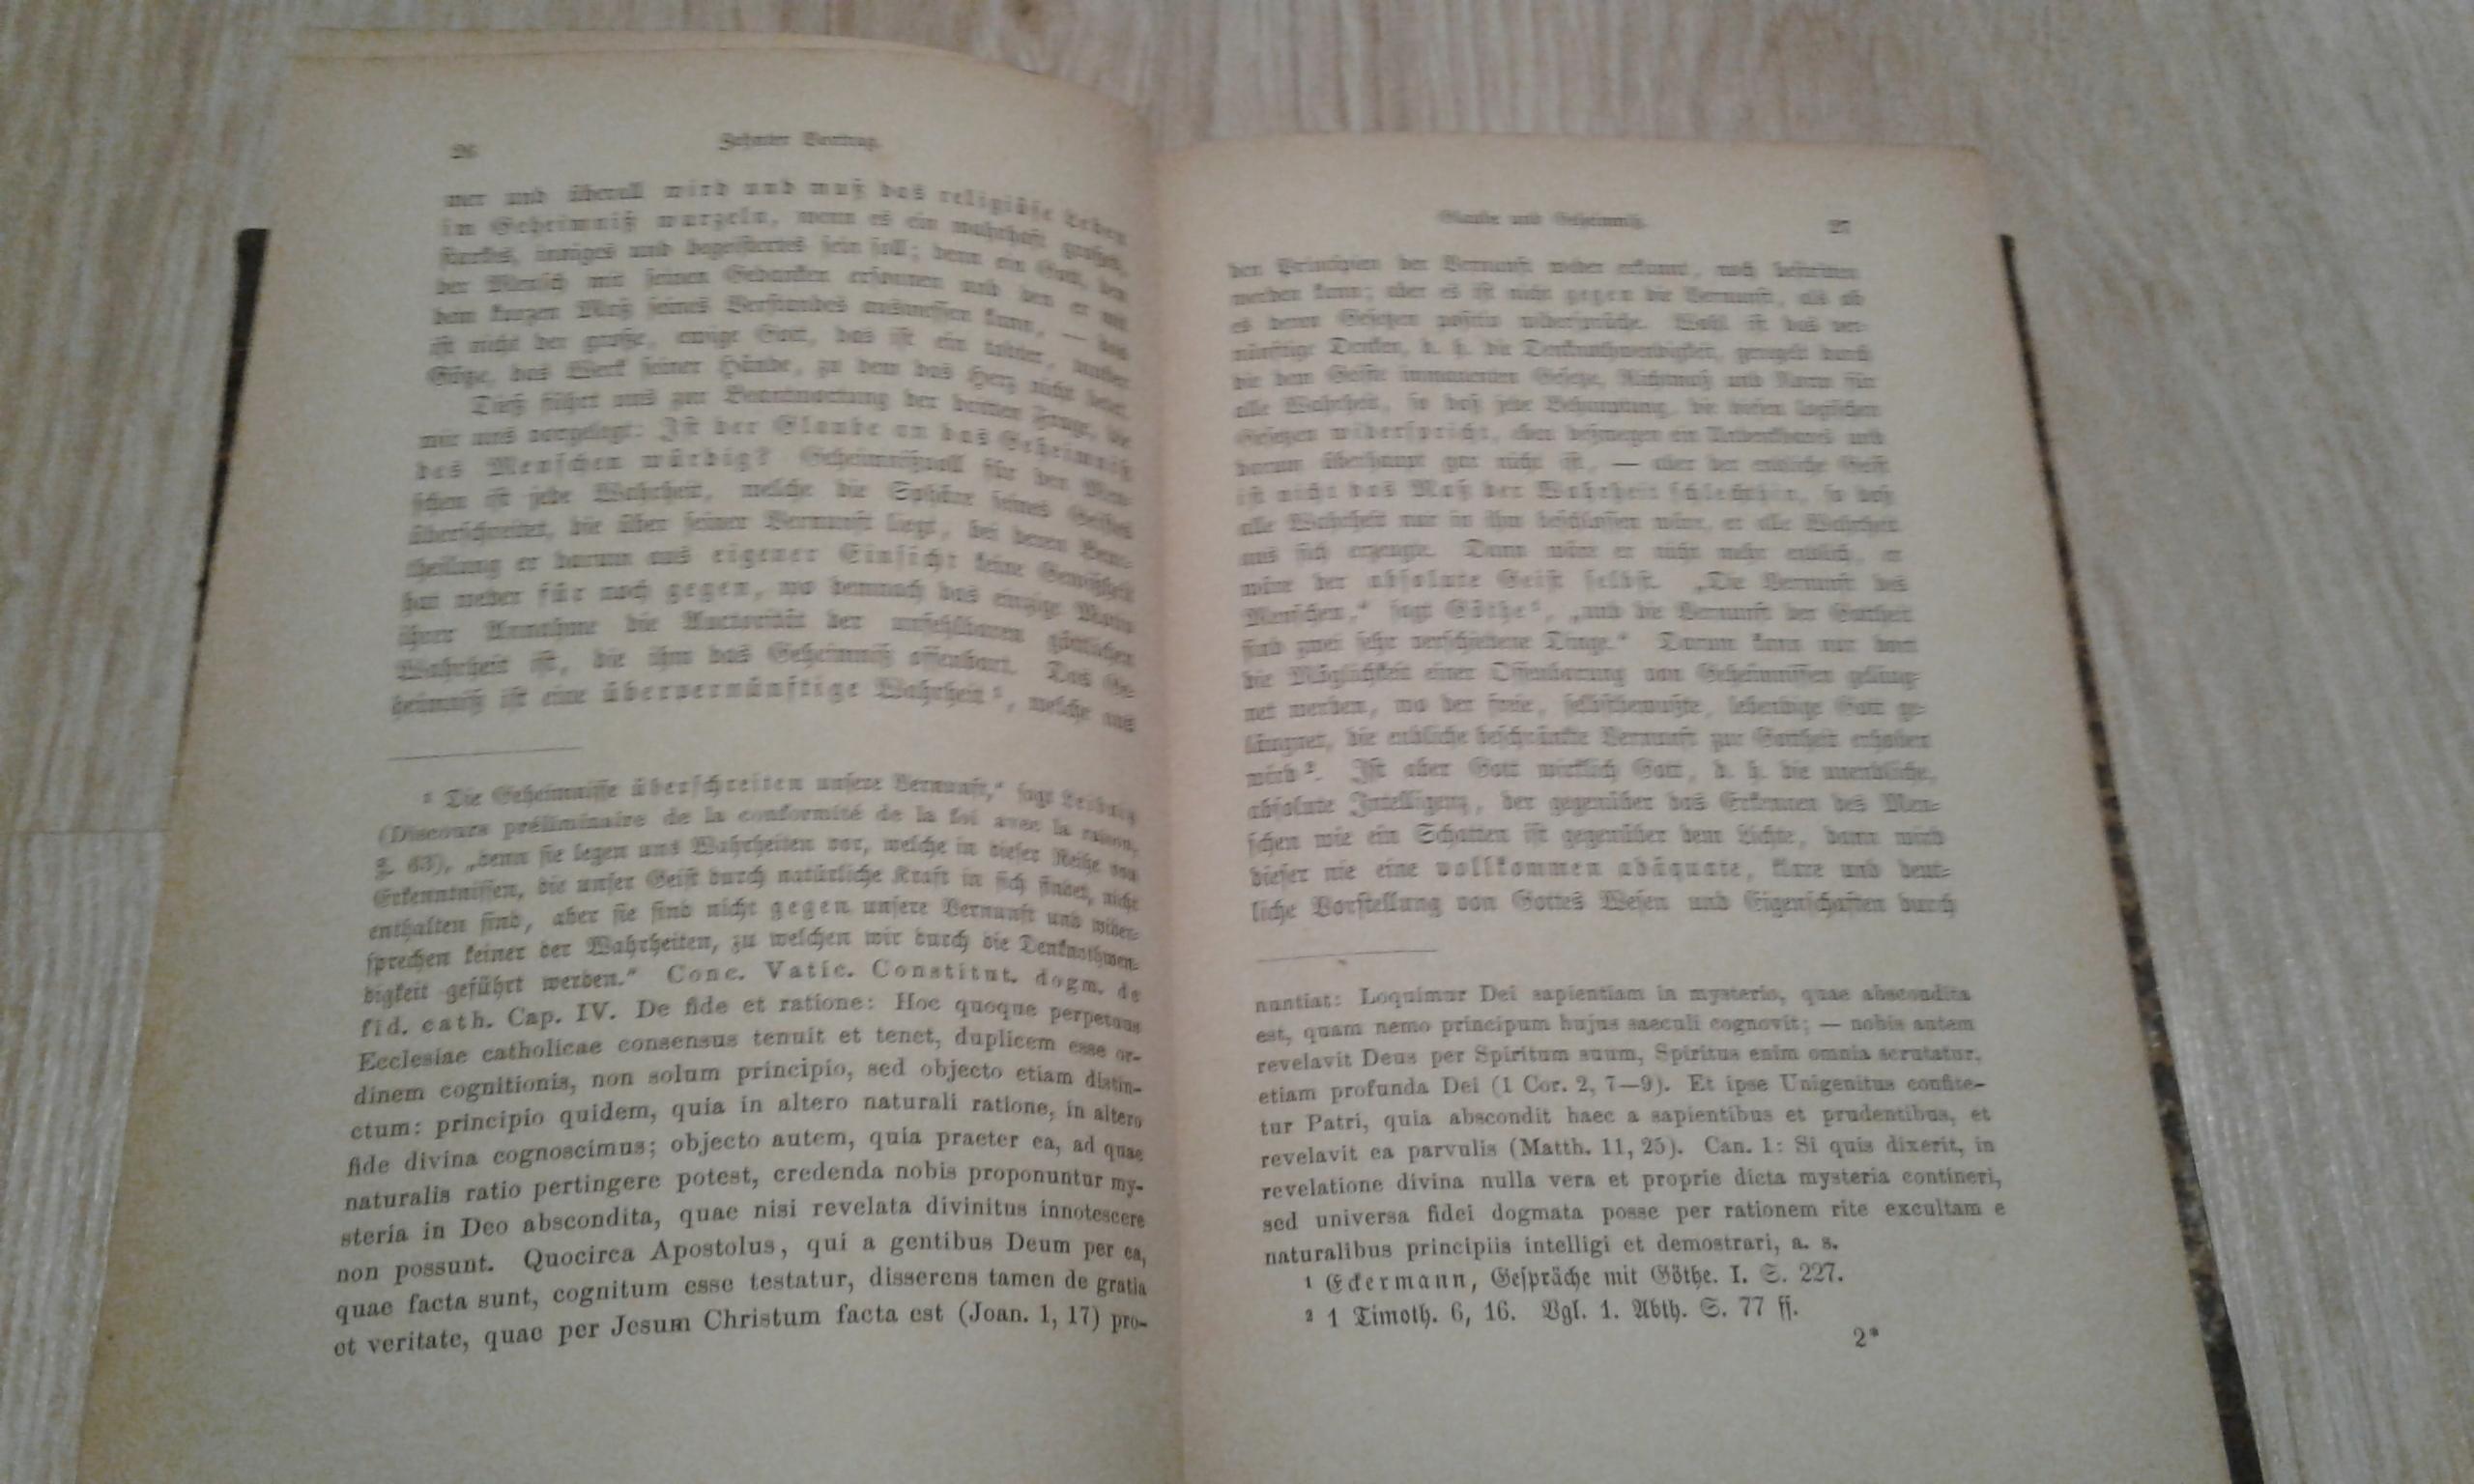 Apologie des christenthums 1875